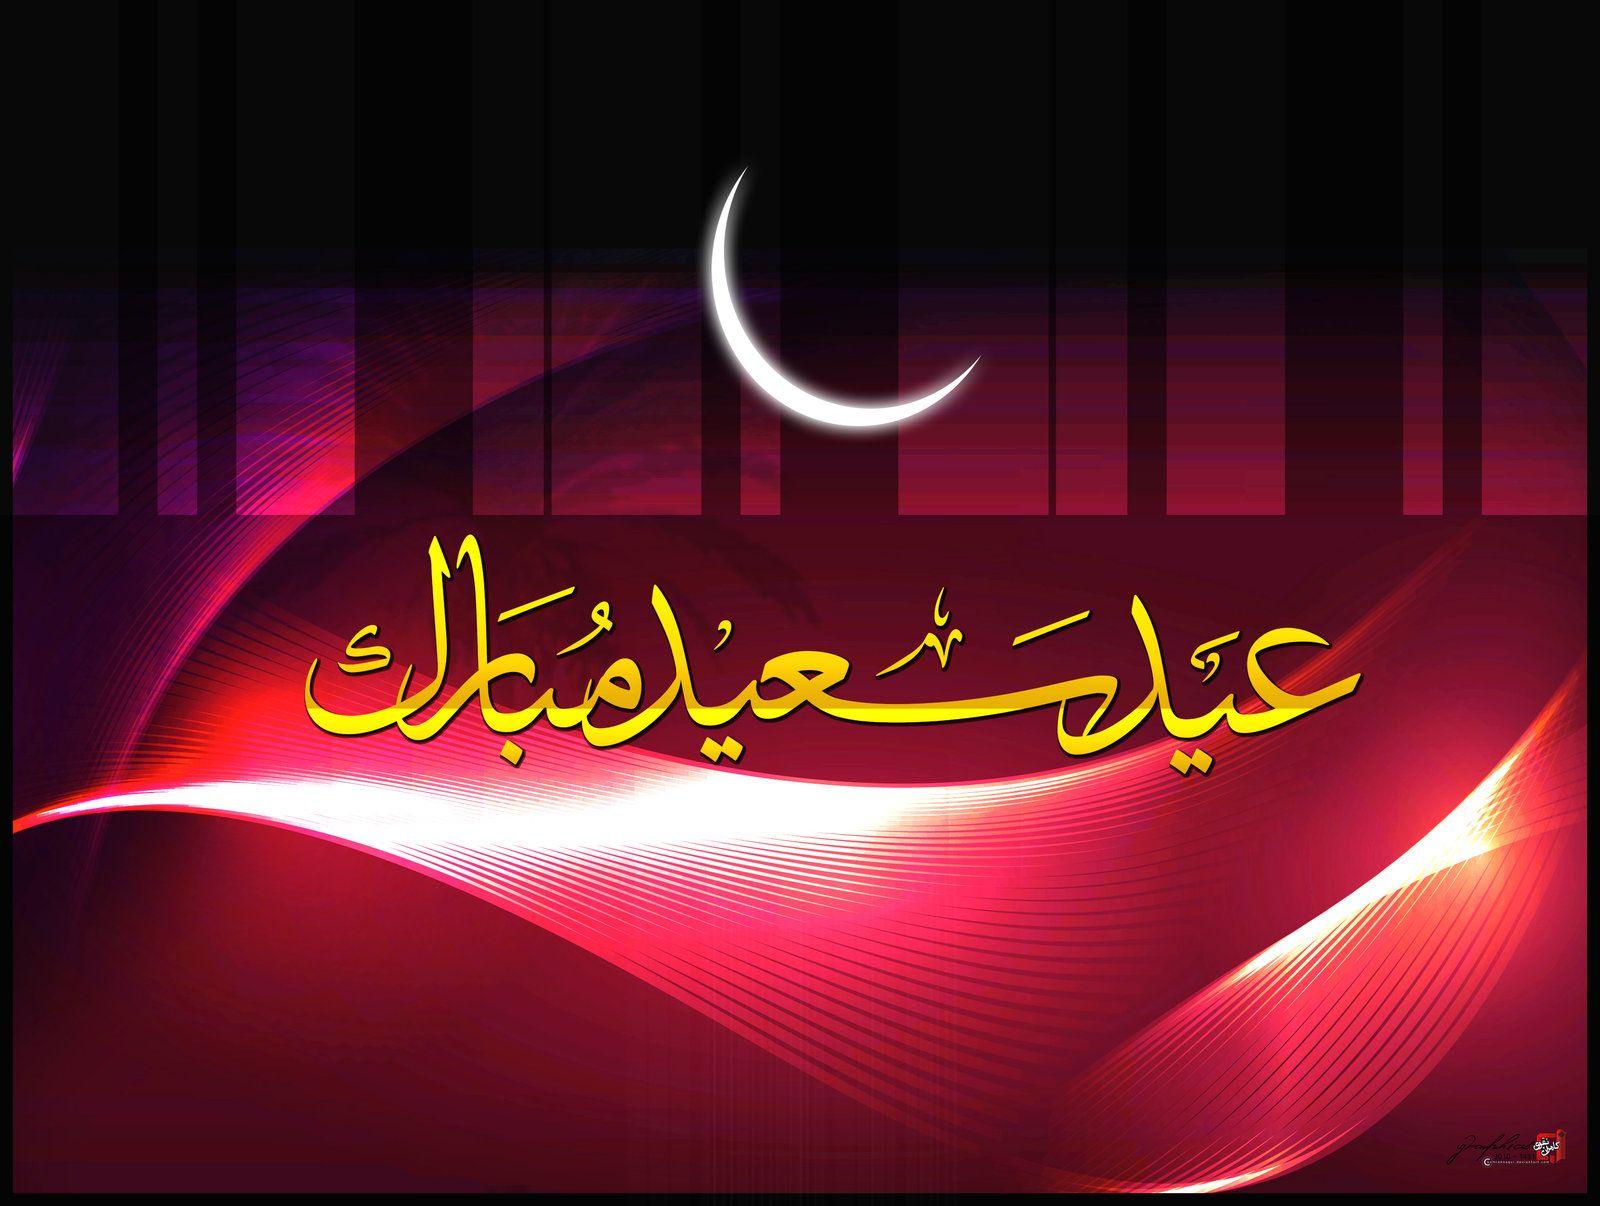 Eid mubarak hd wallpaper 2015 for desktop free download ramadan eid mubarak hd wallpaper 2015 for desktop free download ramadan mubarak 2015 ramadan kareem wallpapers kristyandbryce Choice Image